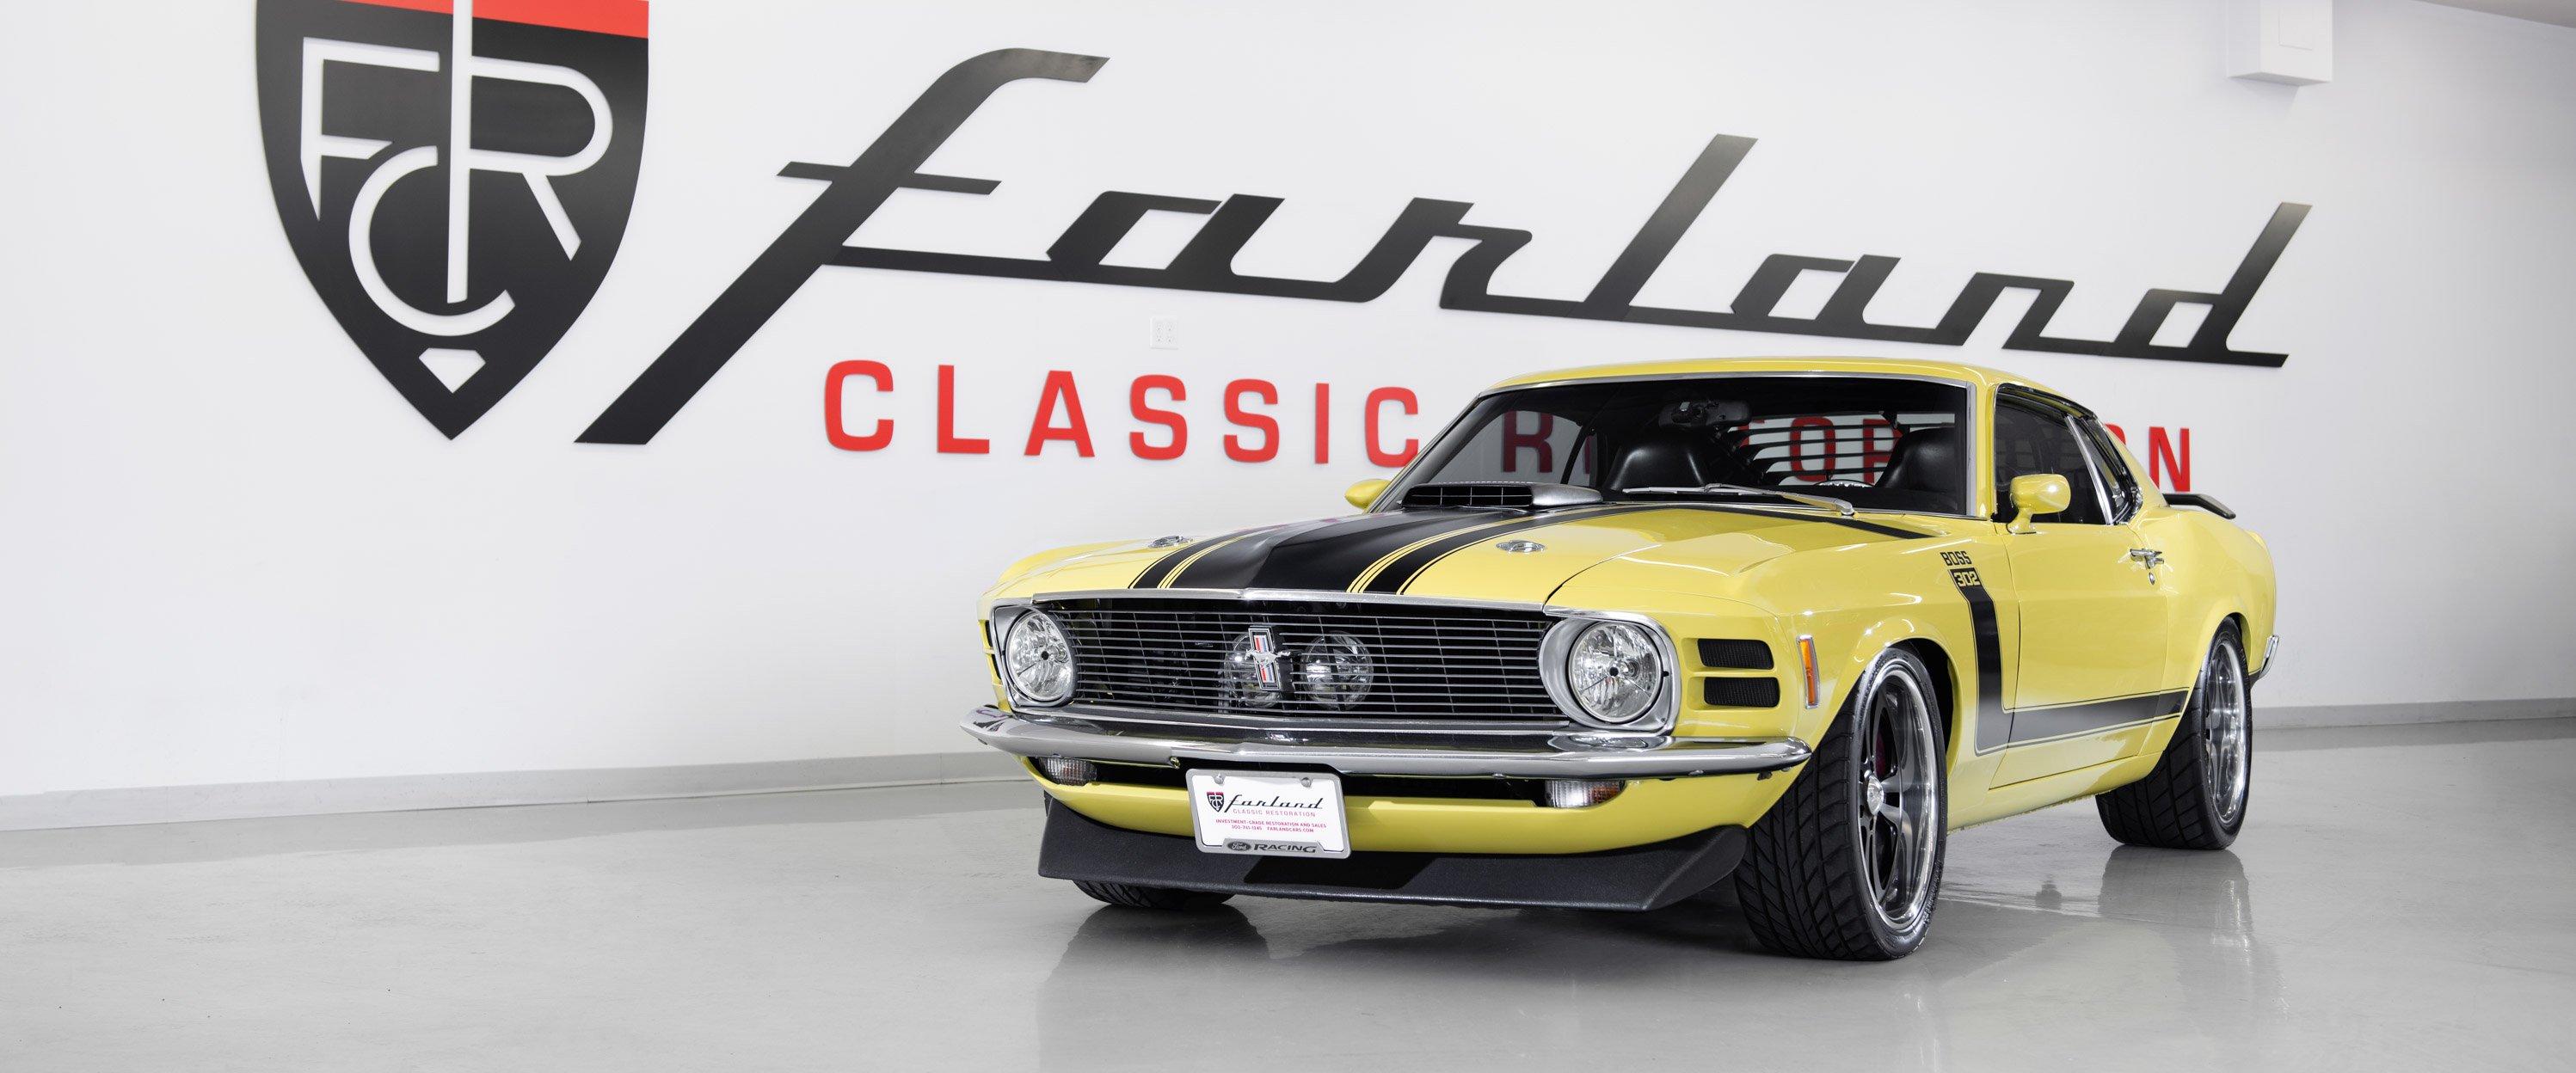 1970-Ford-Boss-Mustang-300-Yellowver2-slideshow-003@2x